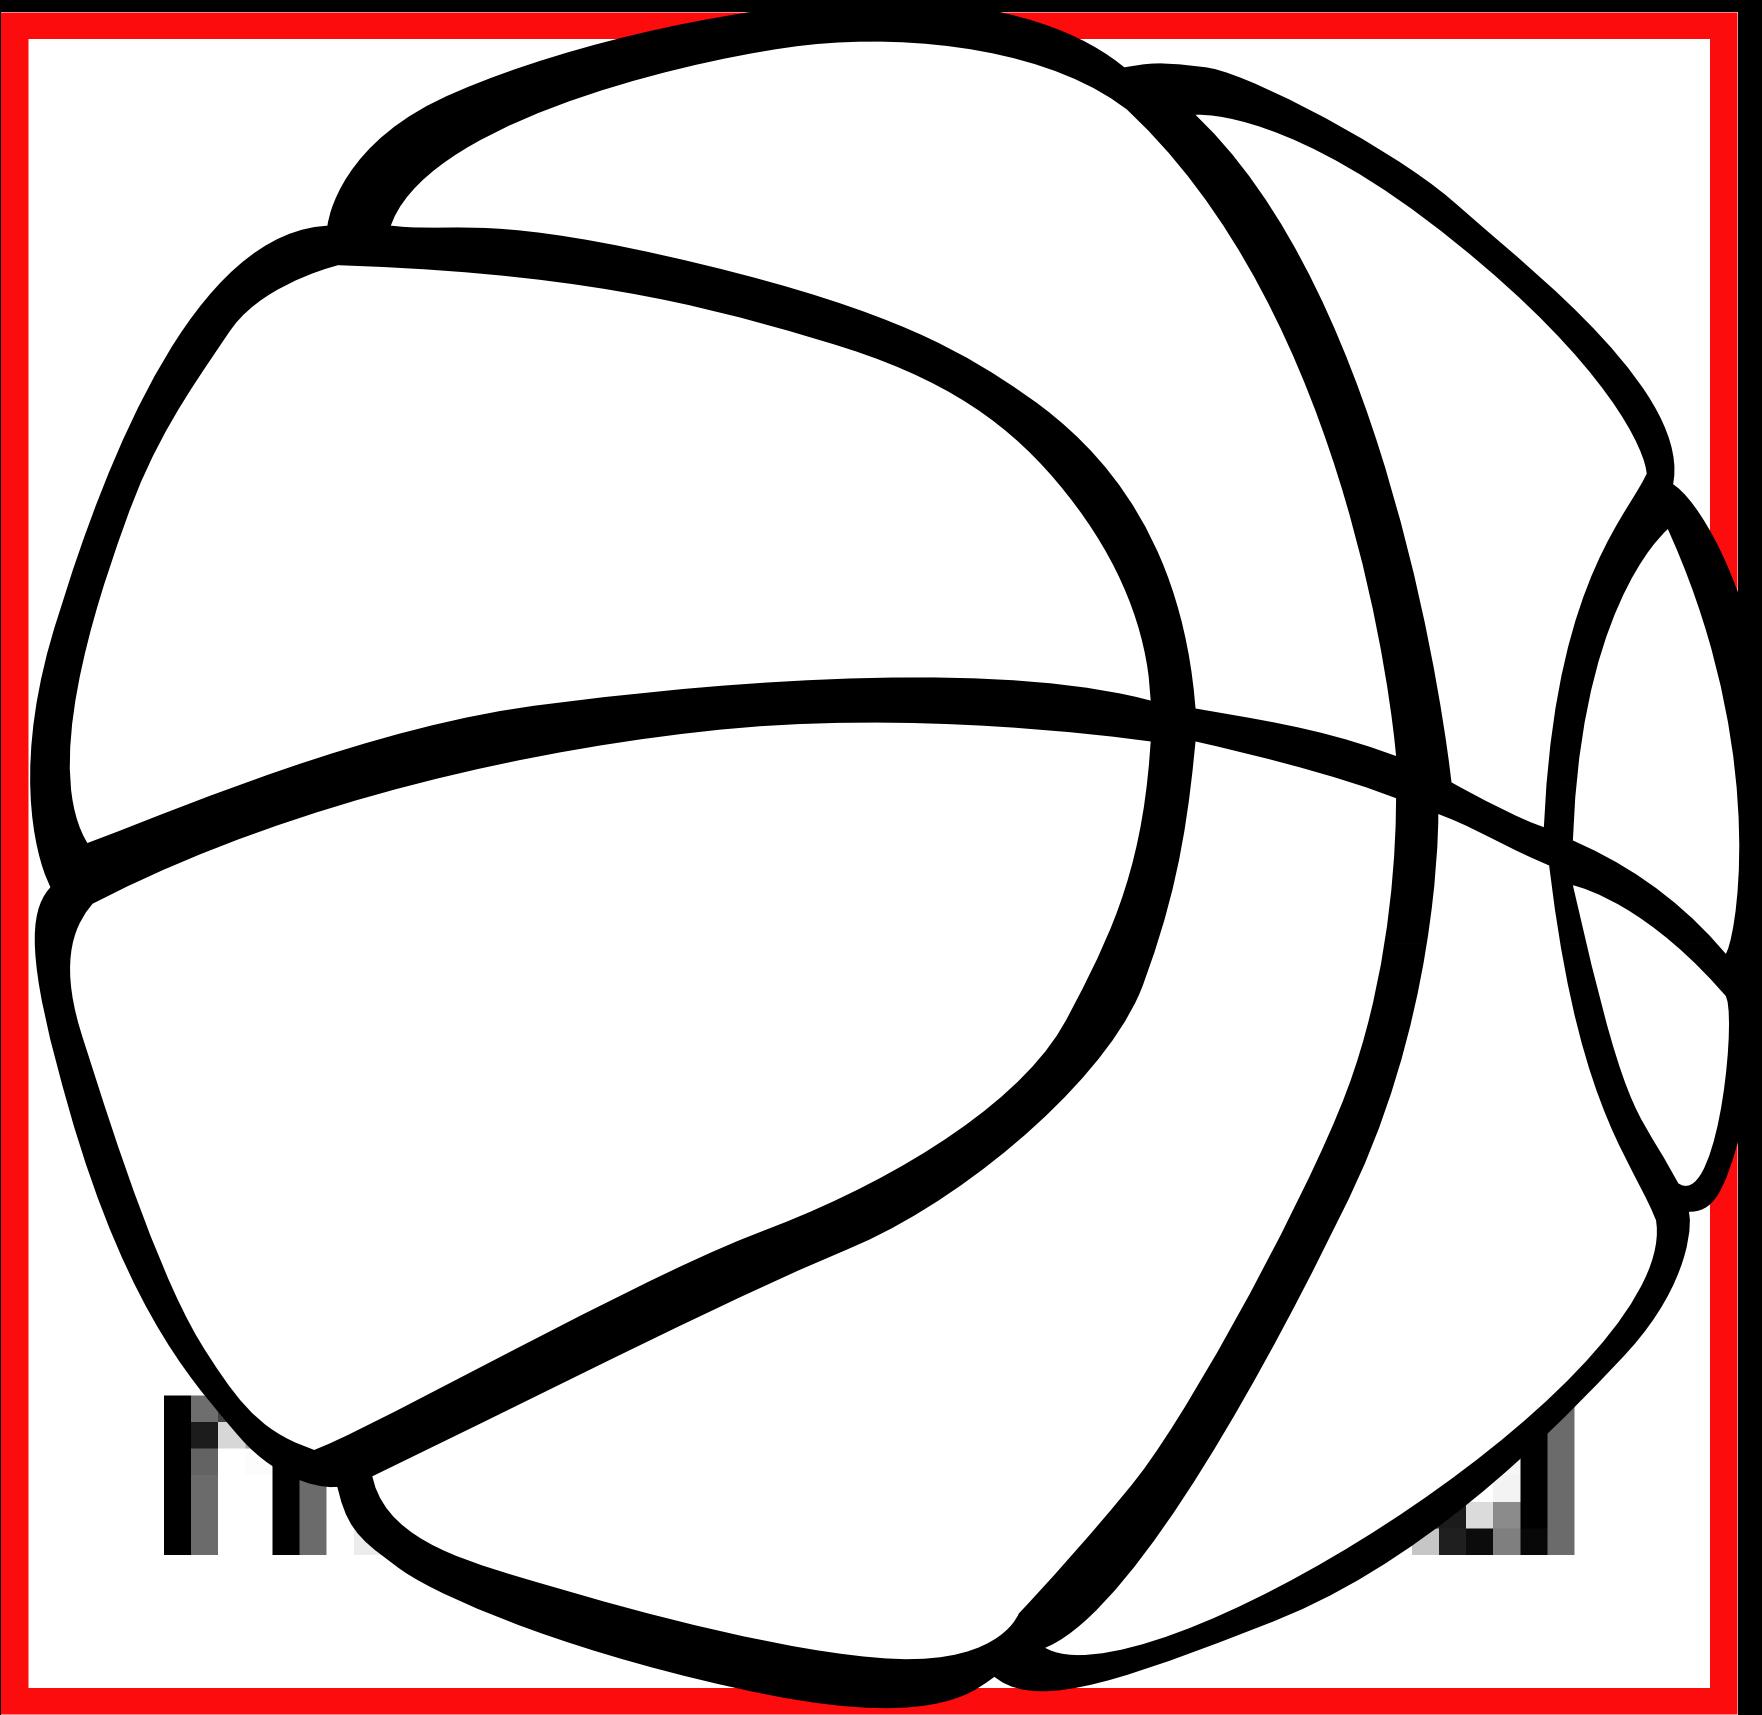 Basketball Clip Art Black White - Basketball Clip Art (1979x1979)